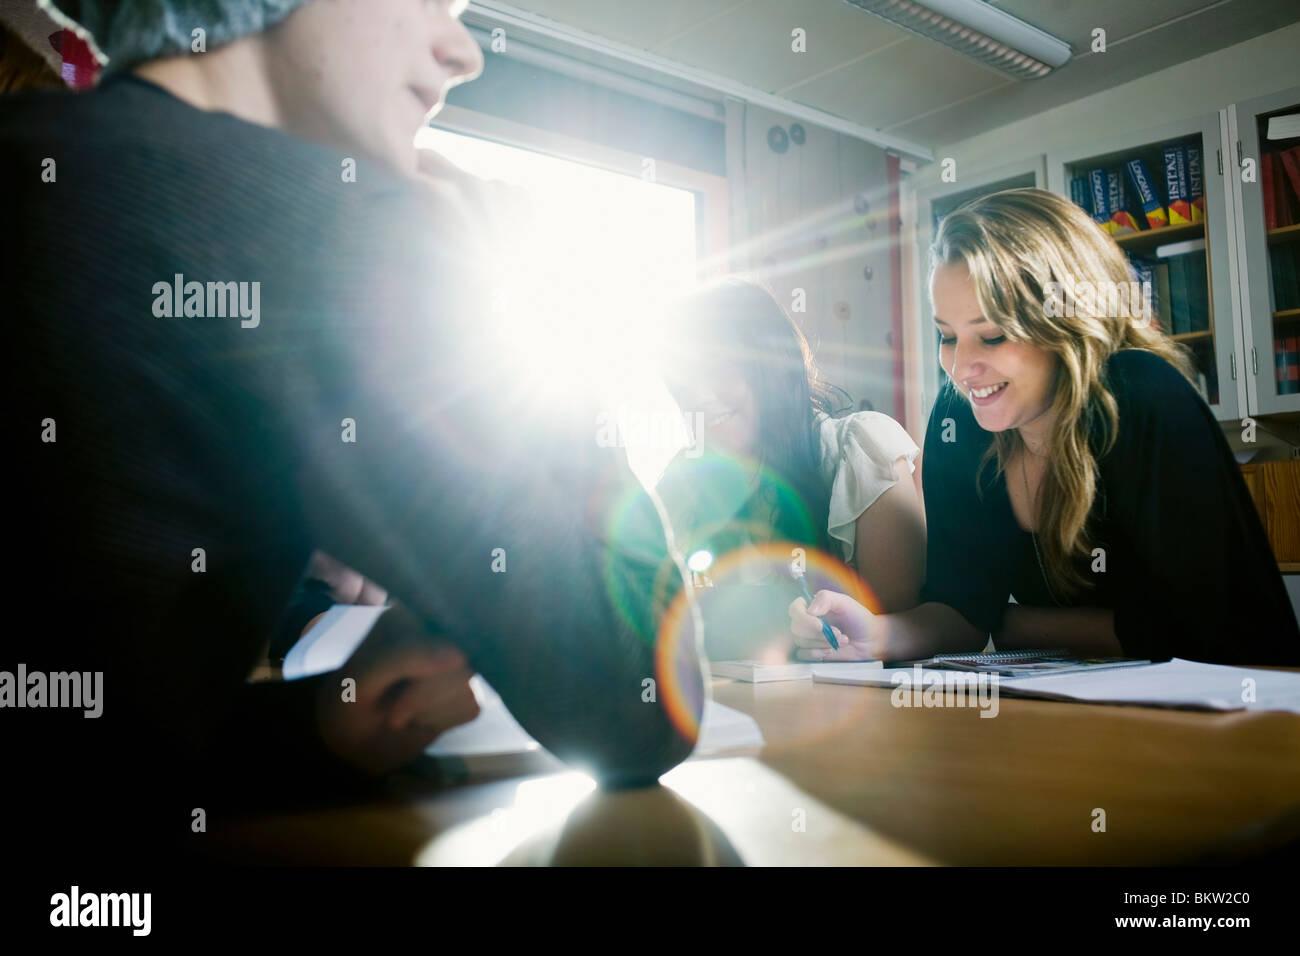 Teamwork in the light - Stock Image